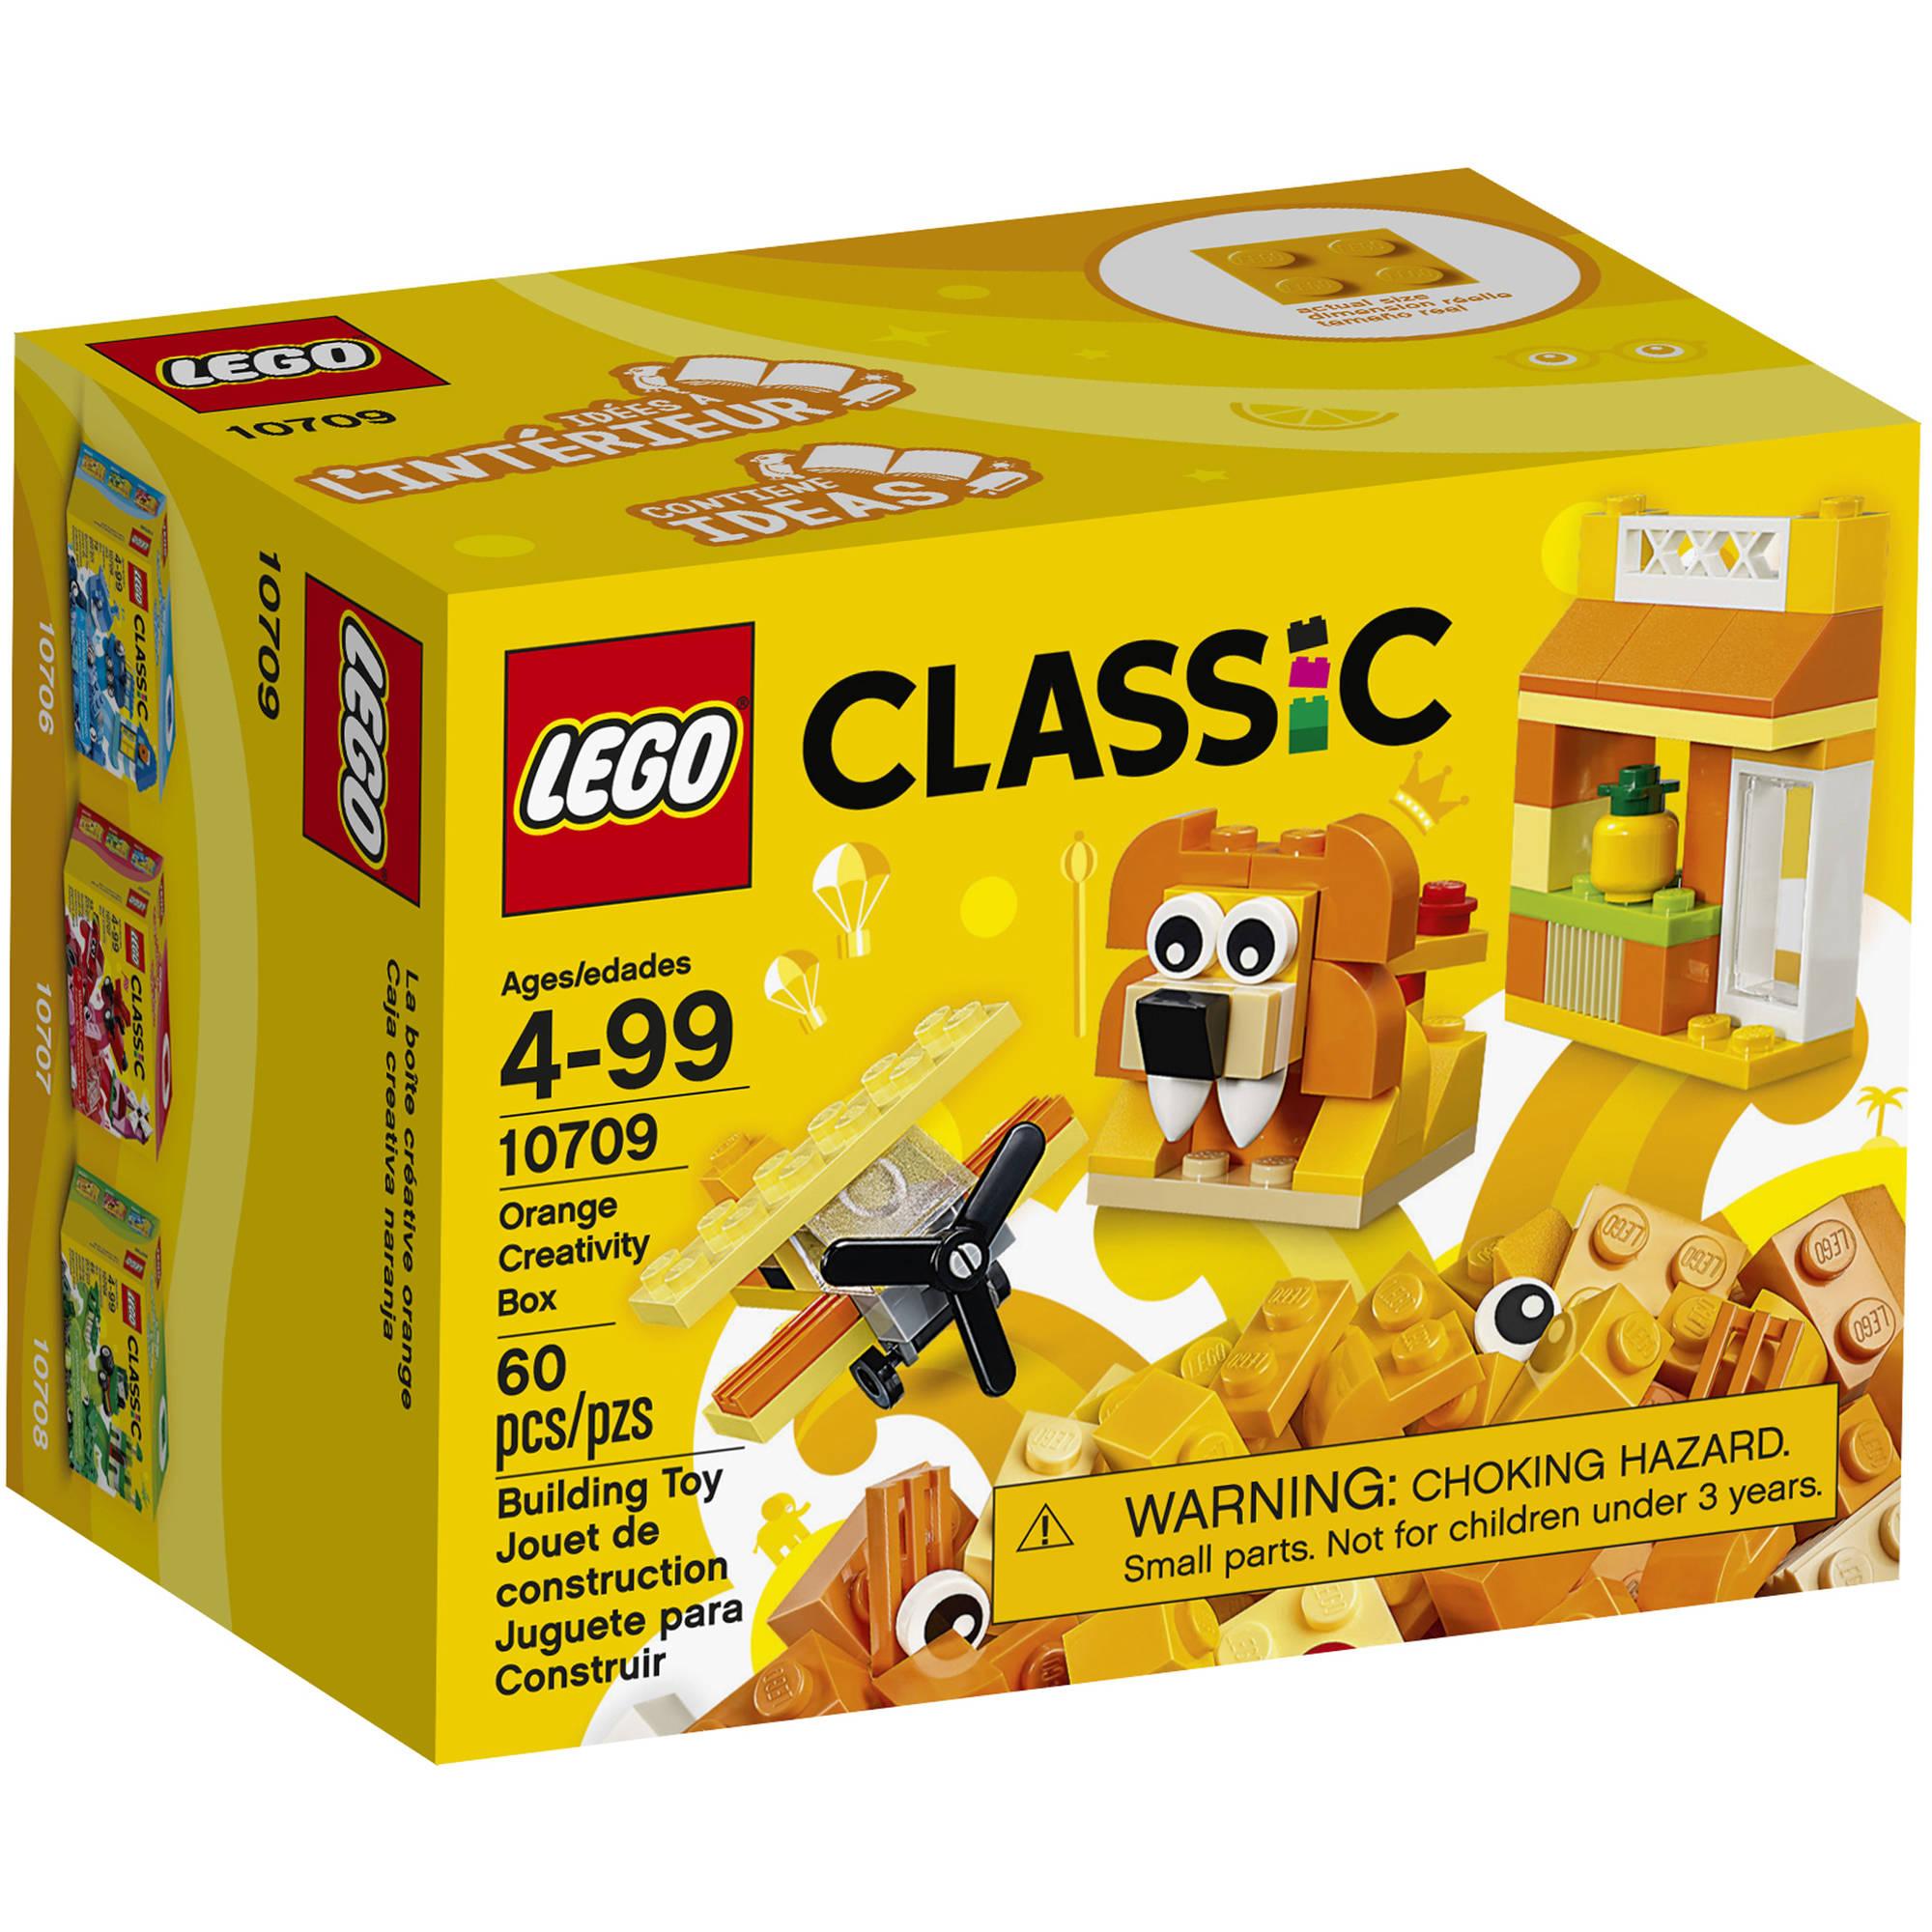 LEGO Classic Creativity Box, Orange (10709)